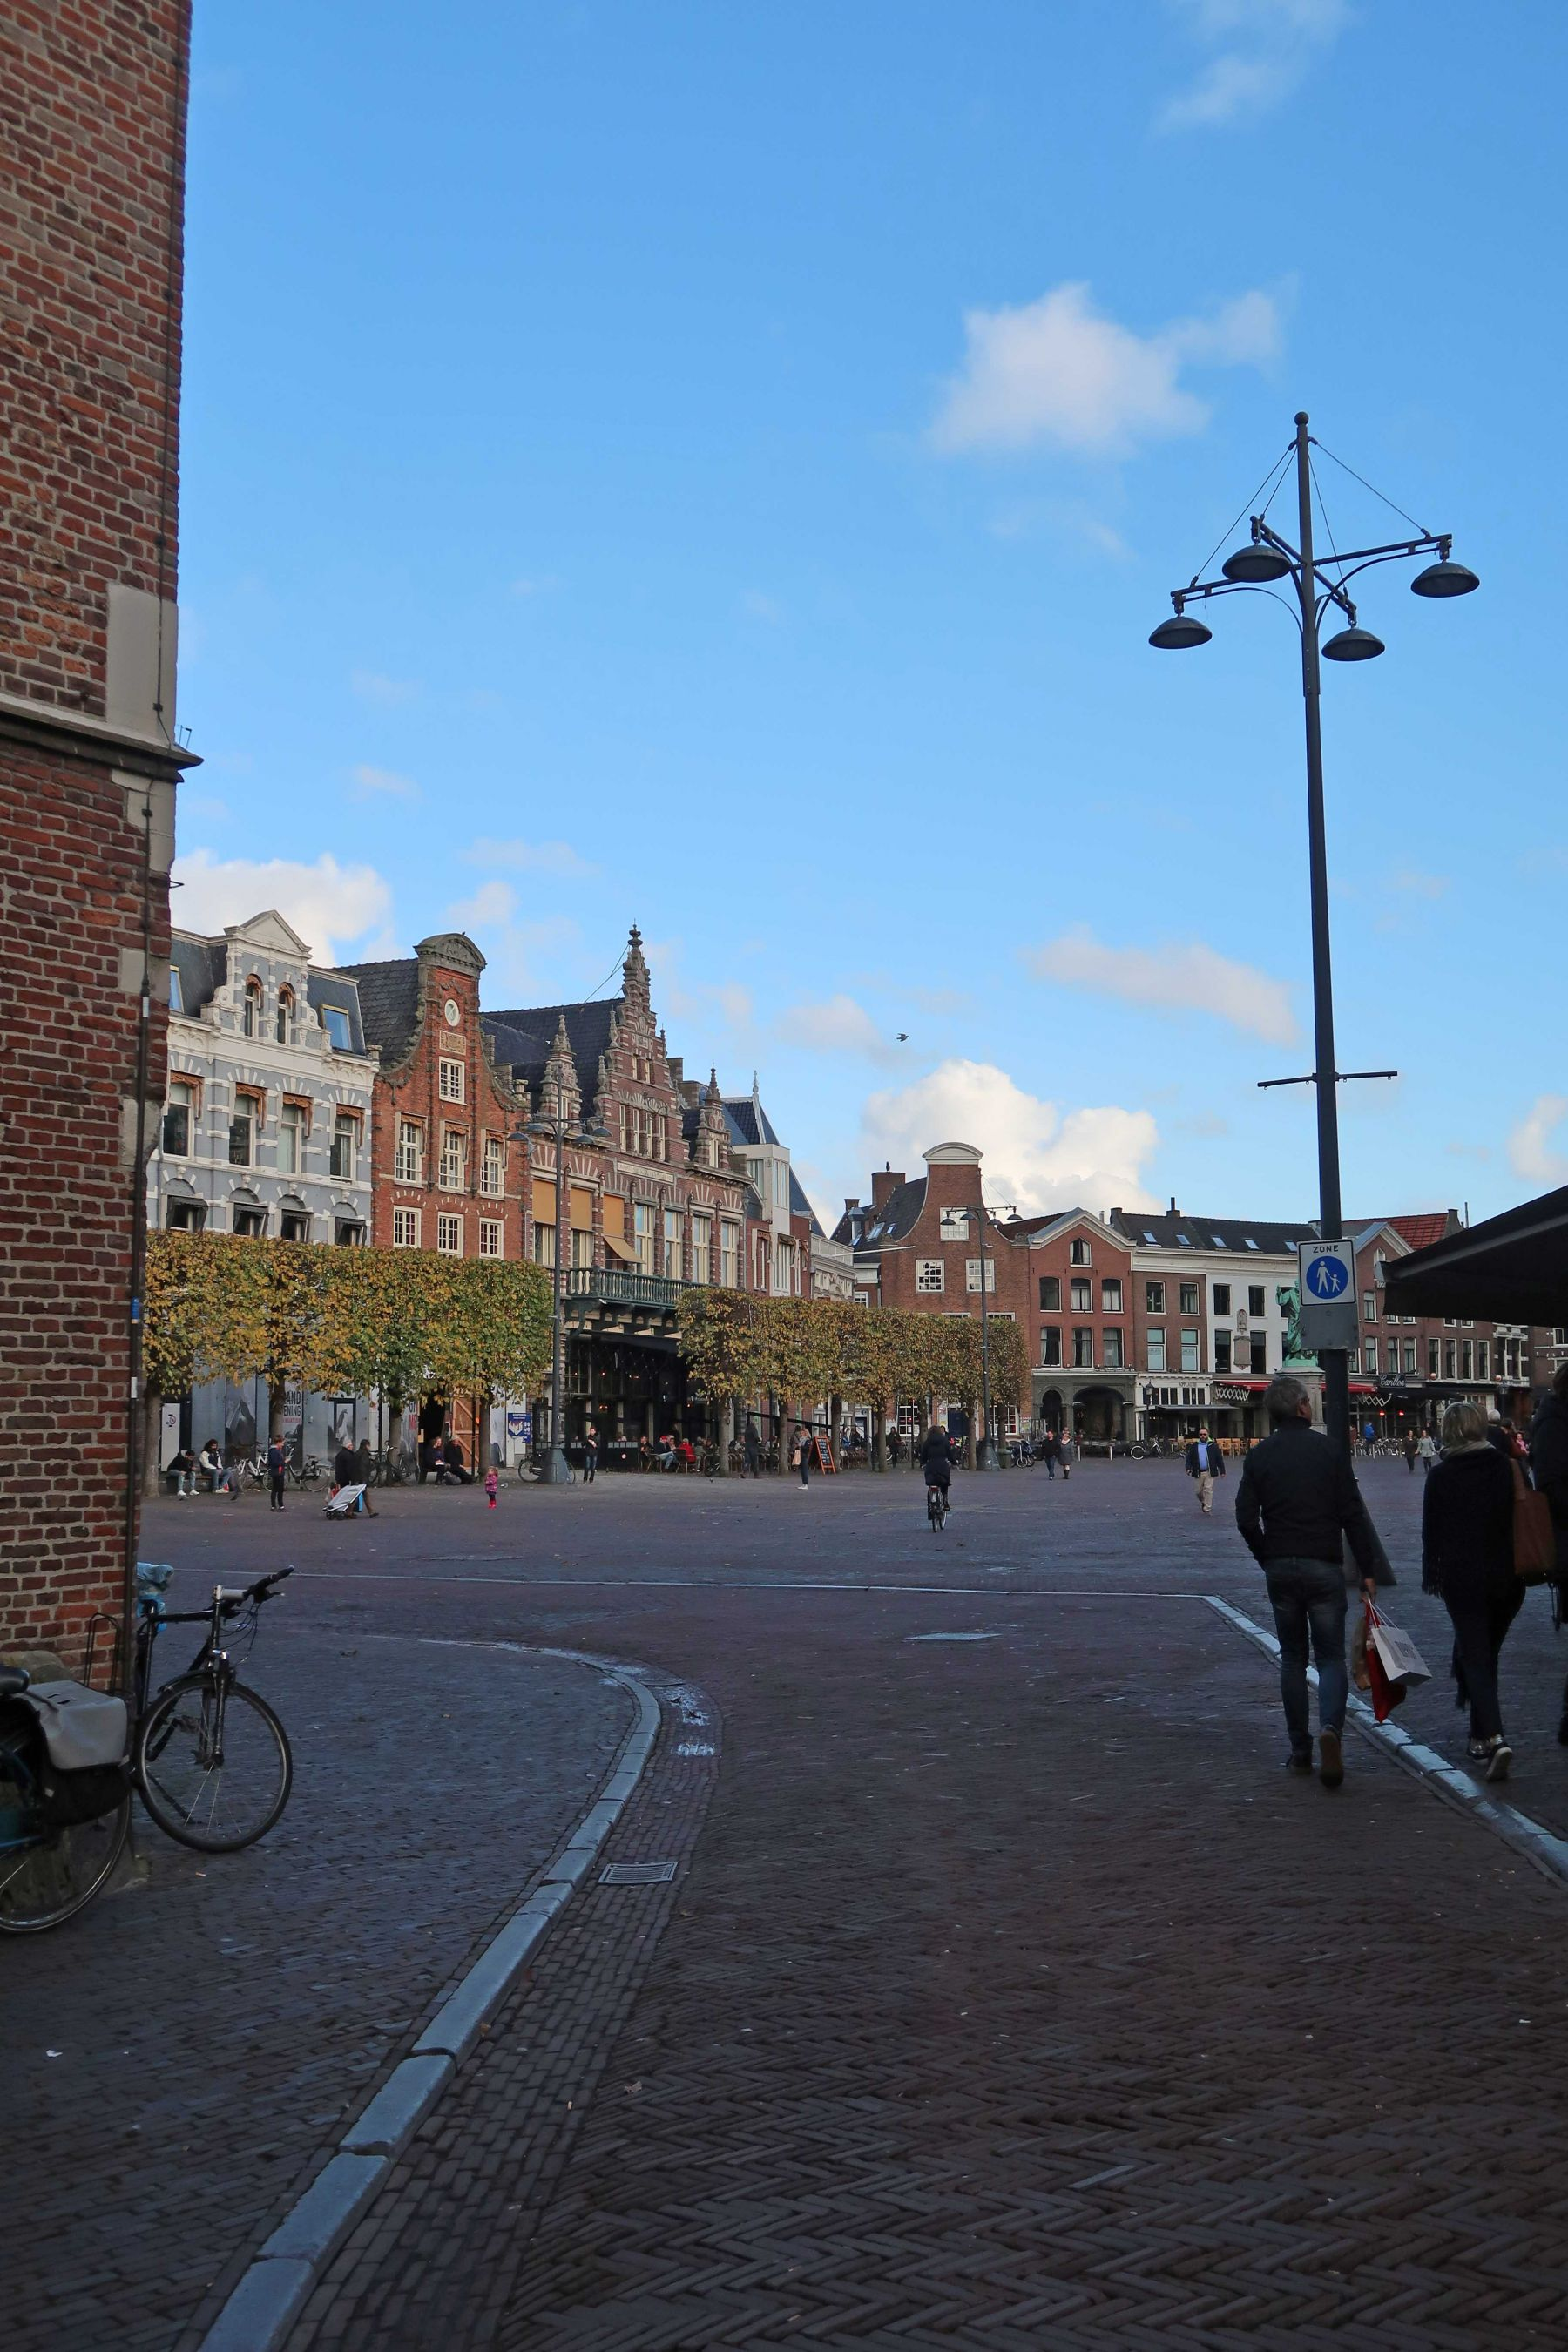 Kinderkleding Haarlem.Hip Haarlem 10x Eten Shoppen En Cultuur